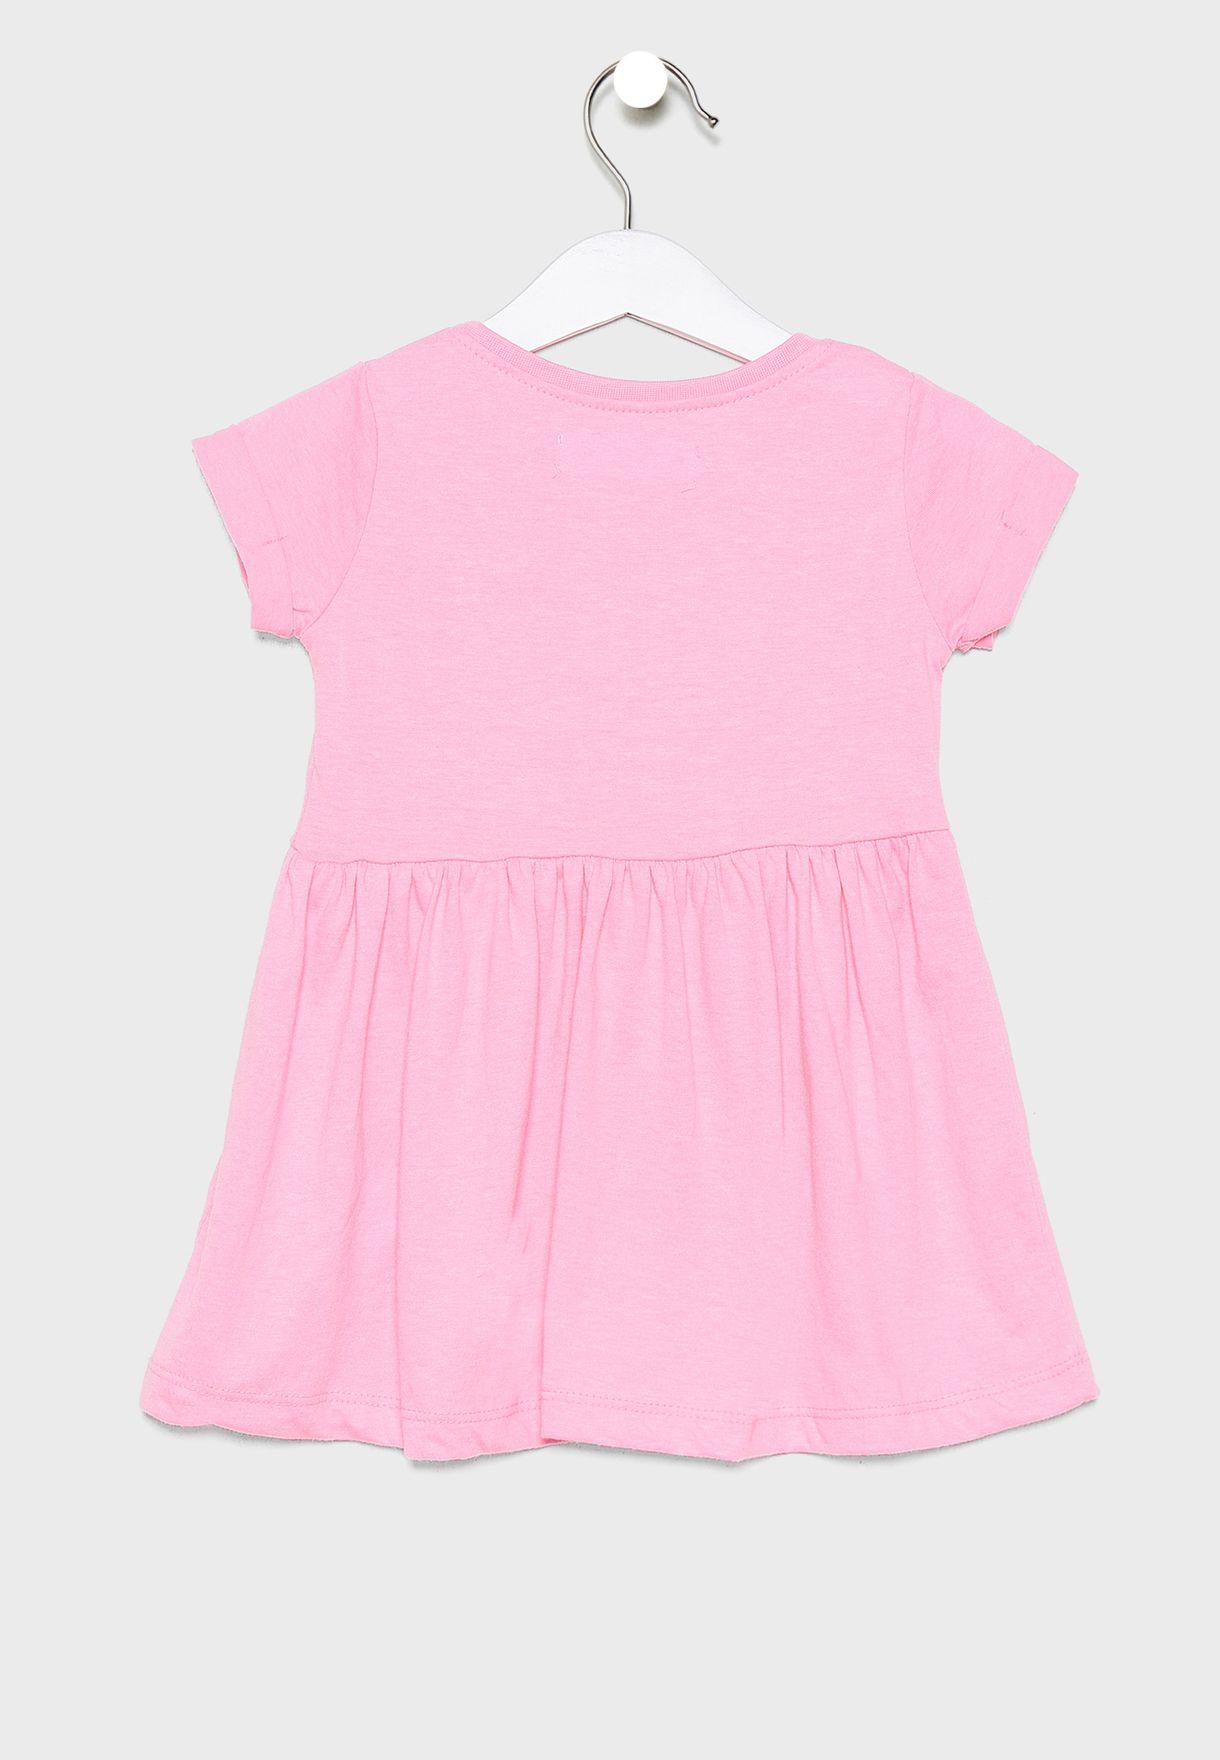 Infant Rainbow Dress